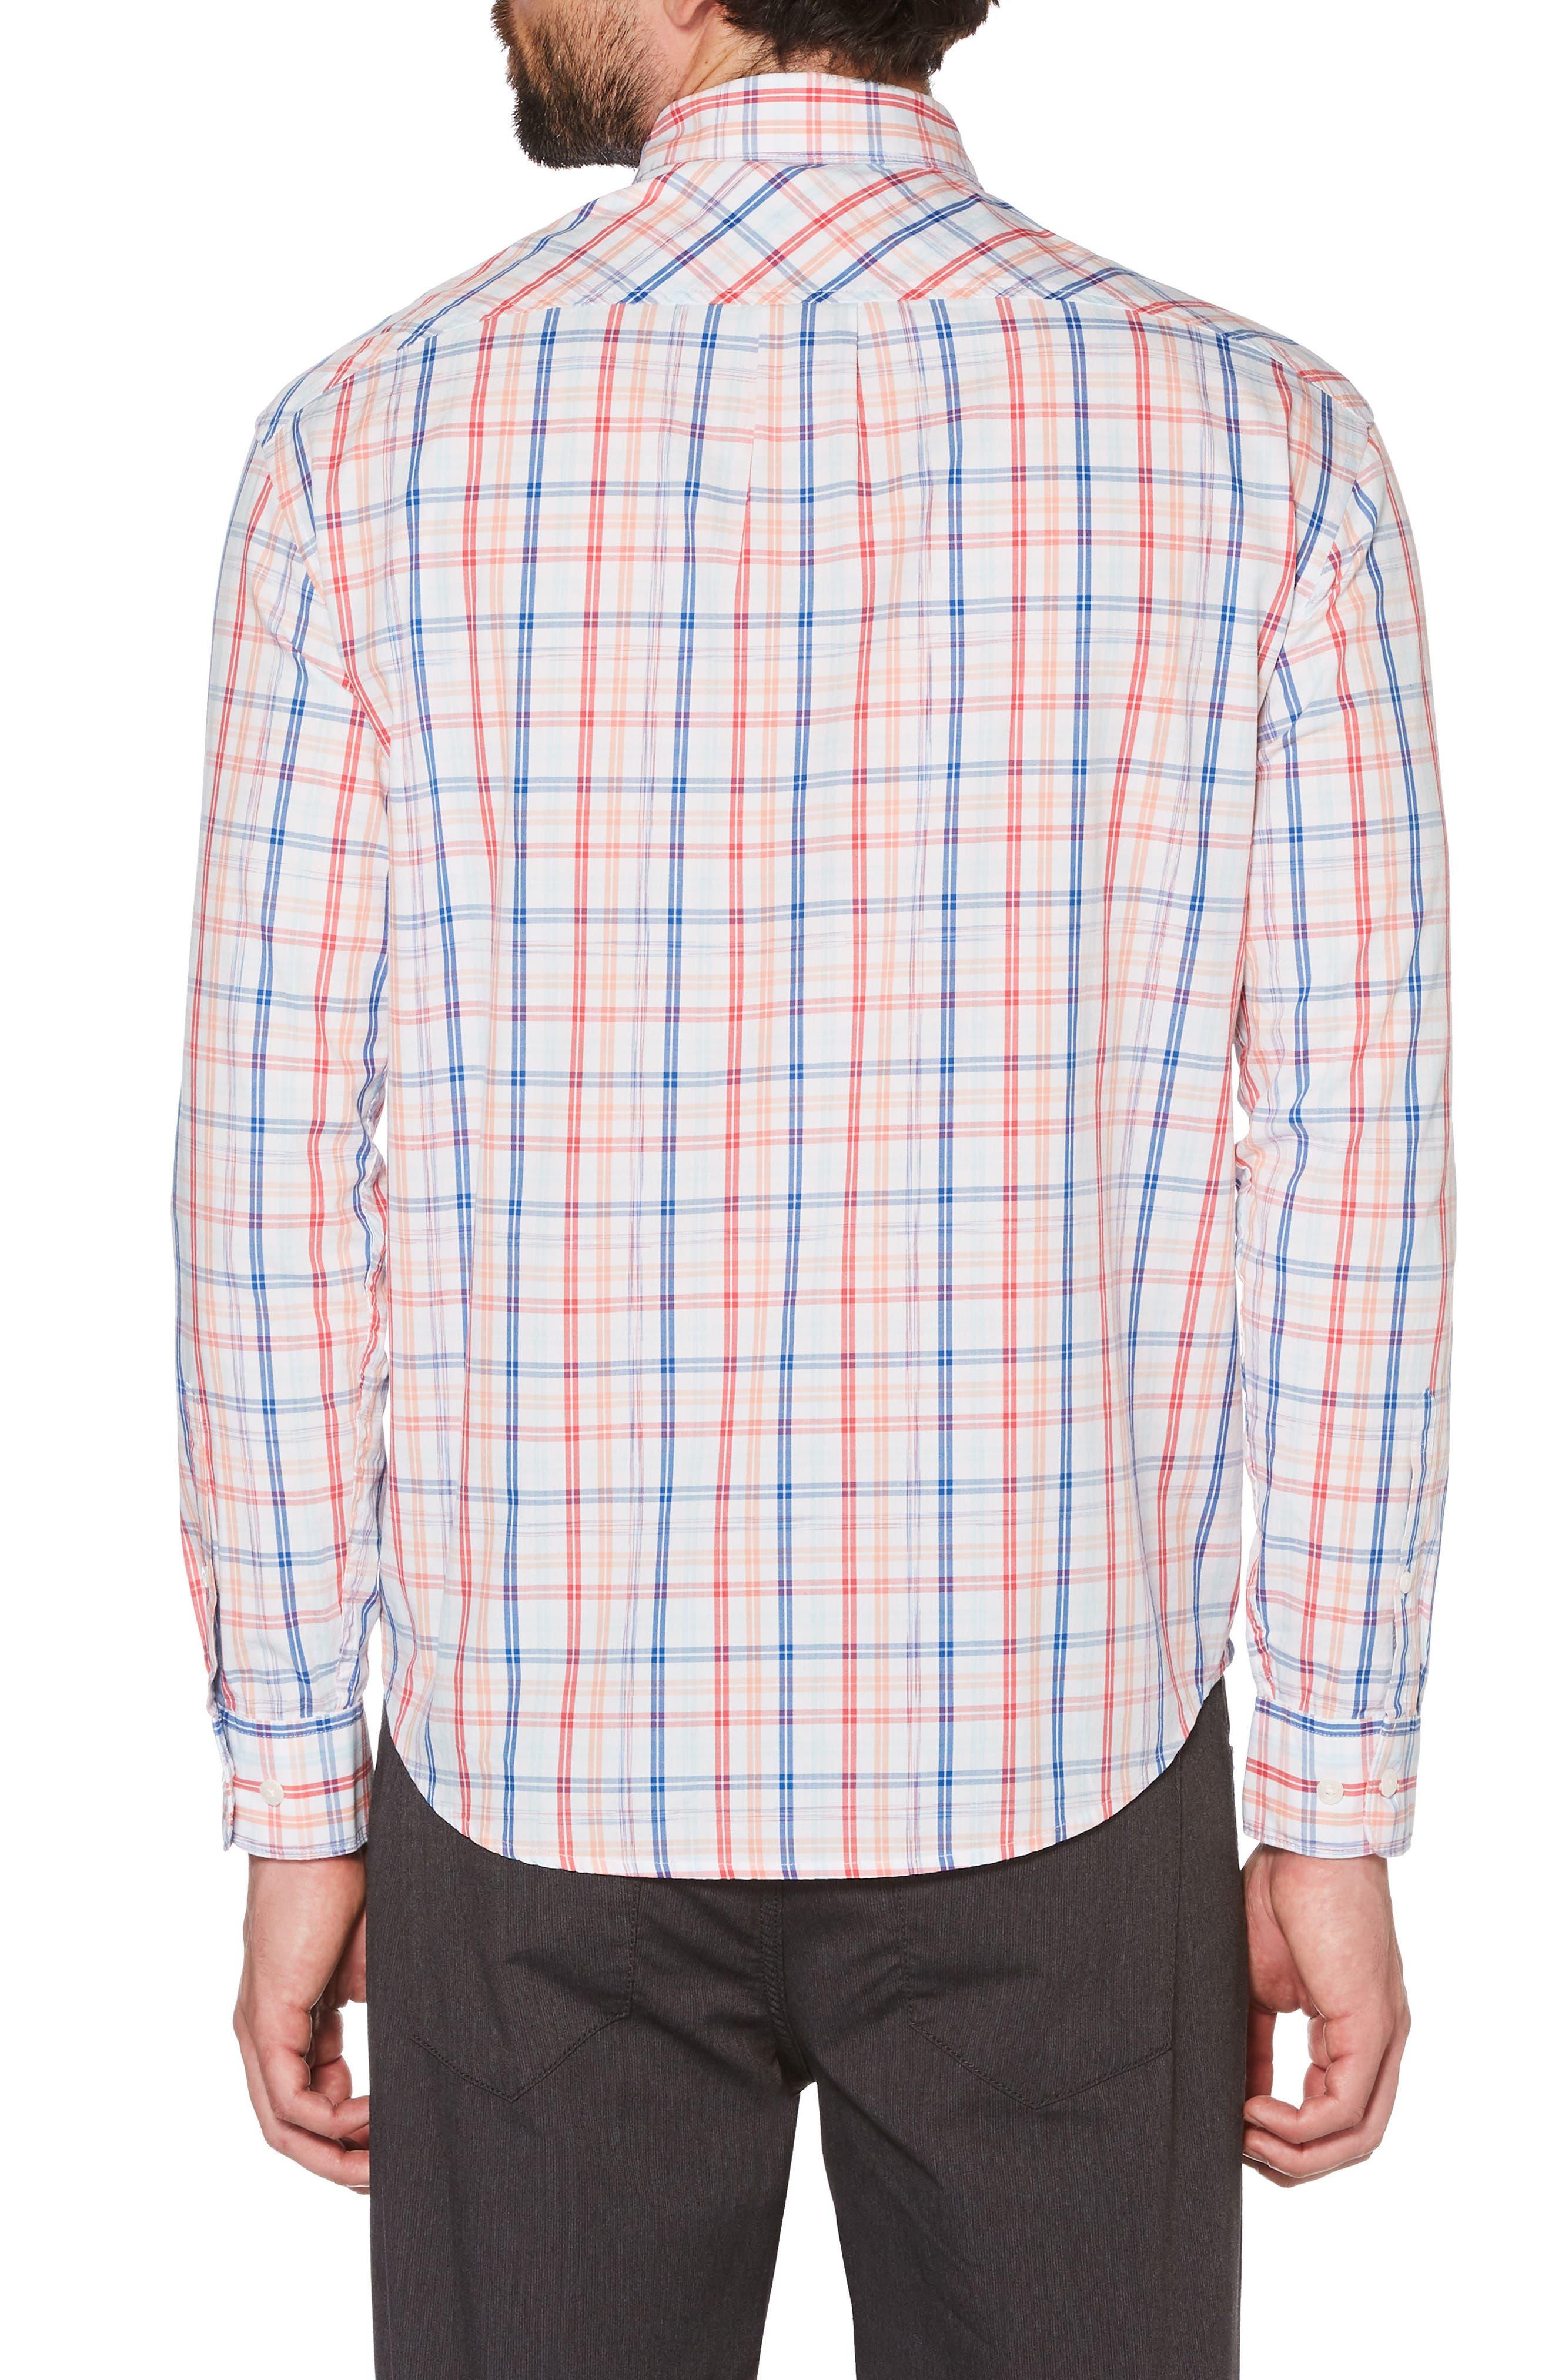 P55 Space Dye Plaid Shirt,                             Alternate thumbnail 2, color,                             Bright White